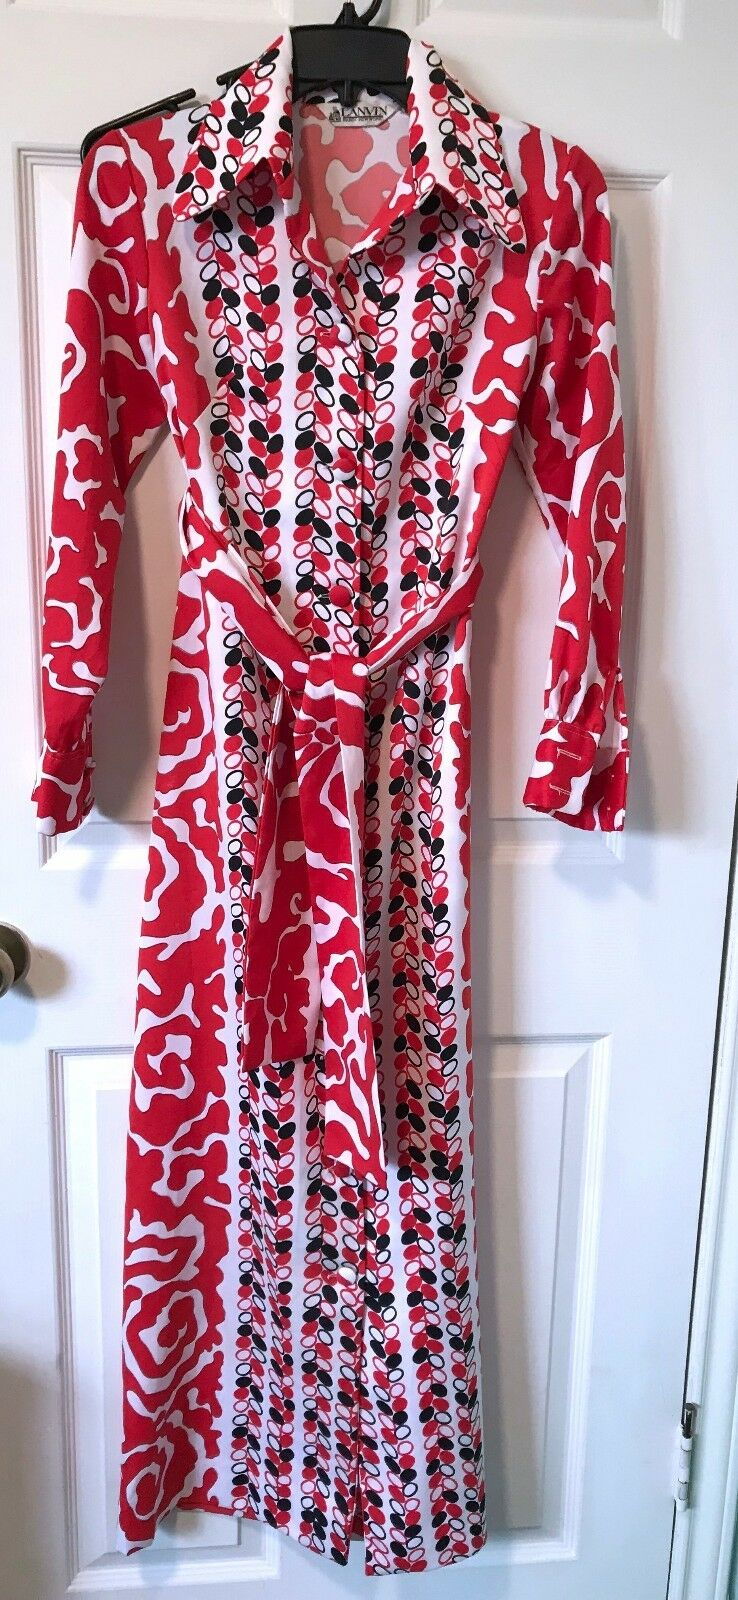 Vintage Lanvin Paris New York 1960s-1970s Mod Full-length Dress - Size 8